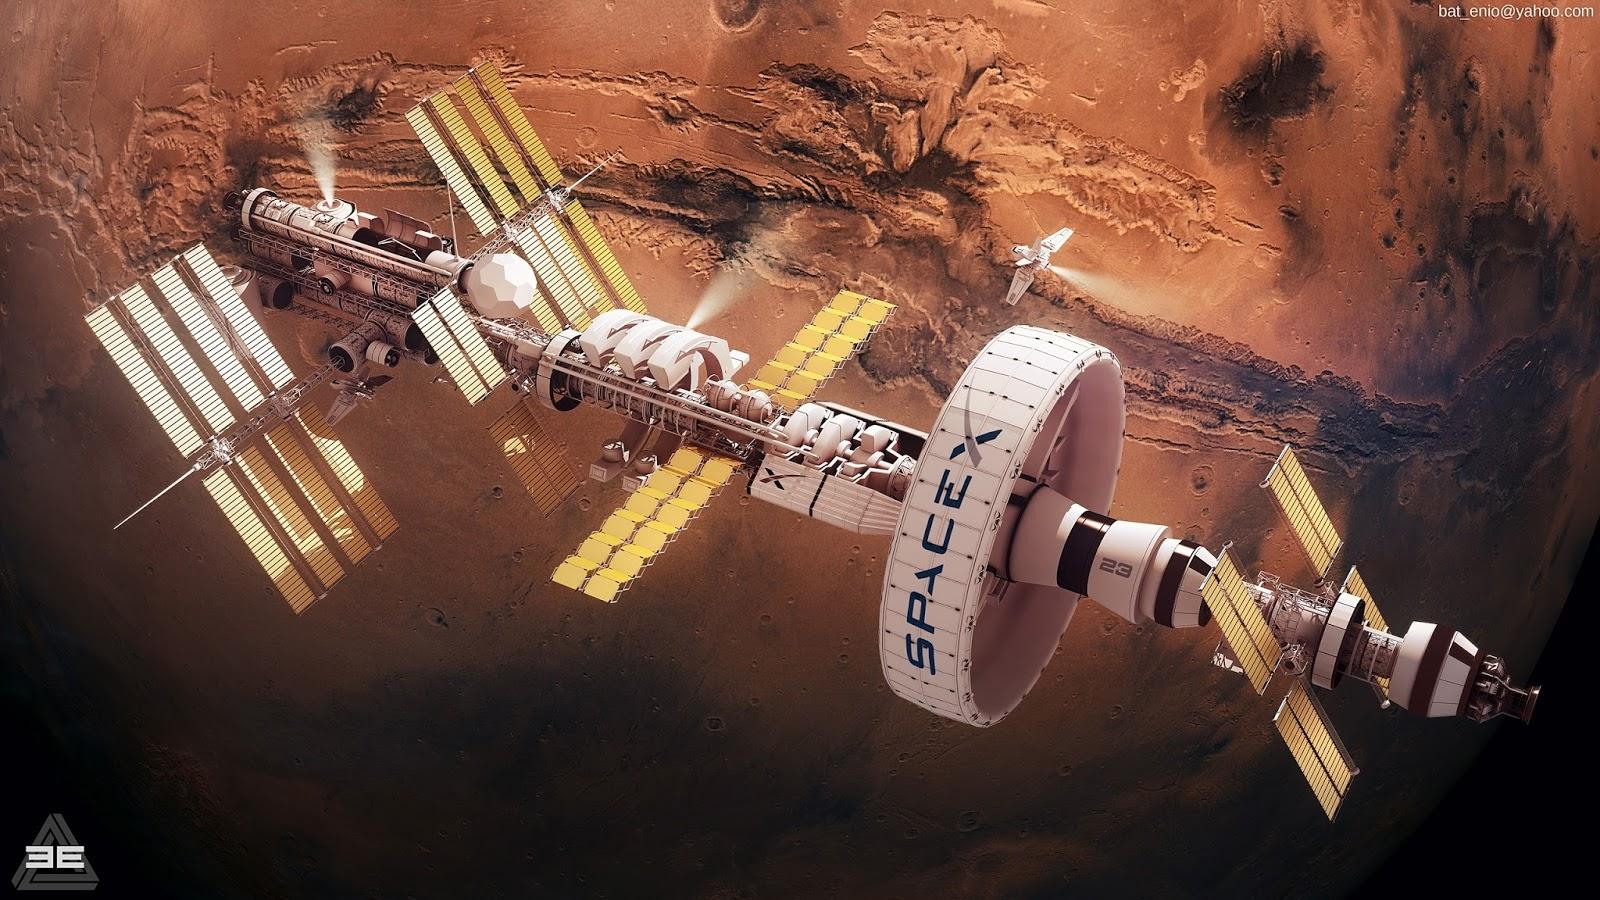 spacex mars base - photo #24